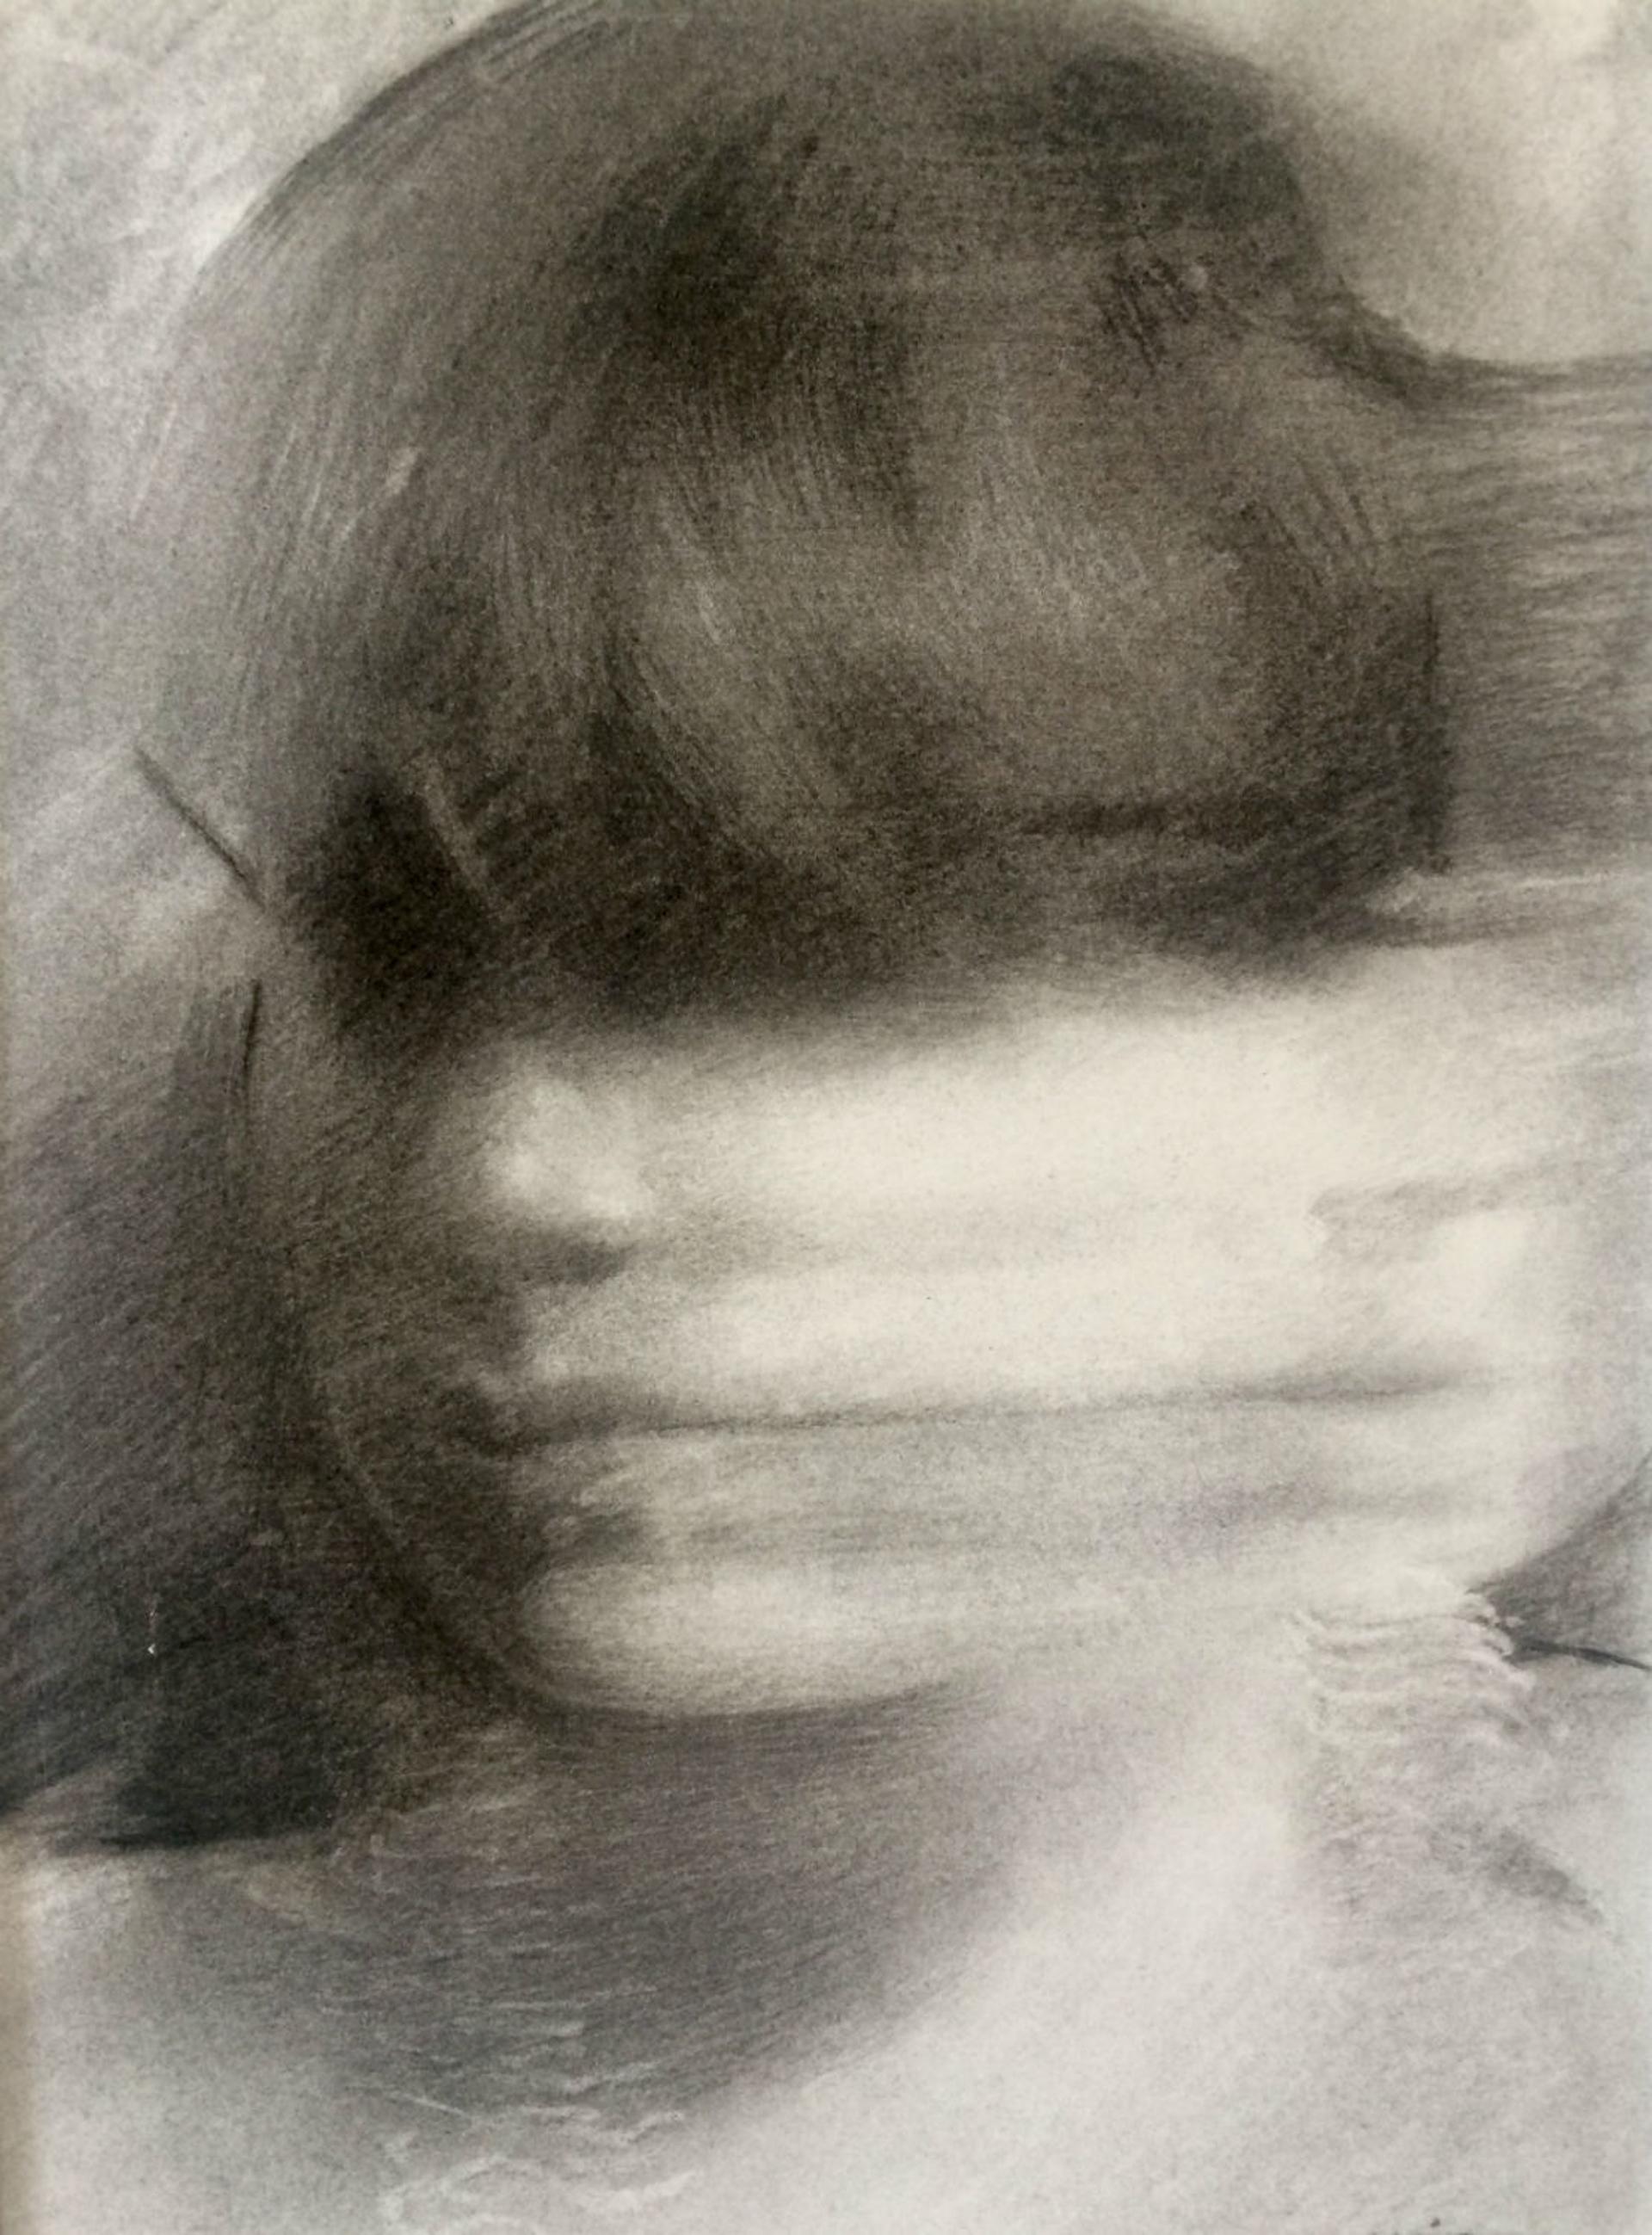 Portrait In Motion by Mia Bergeron